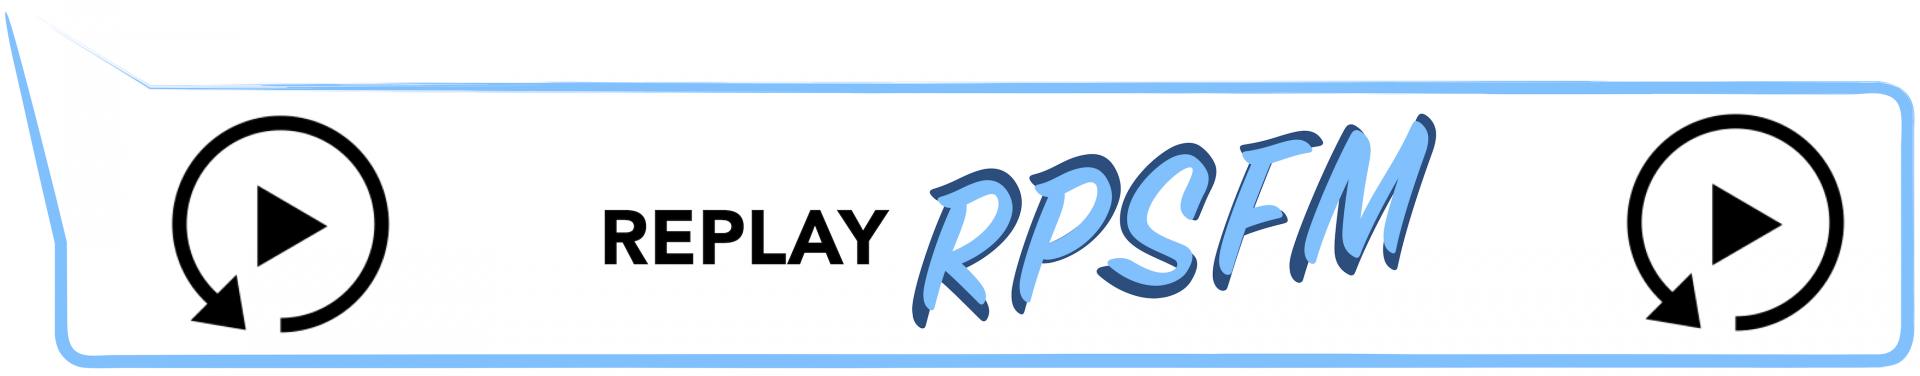 REPLAY RPSFM